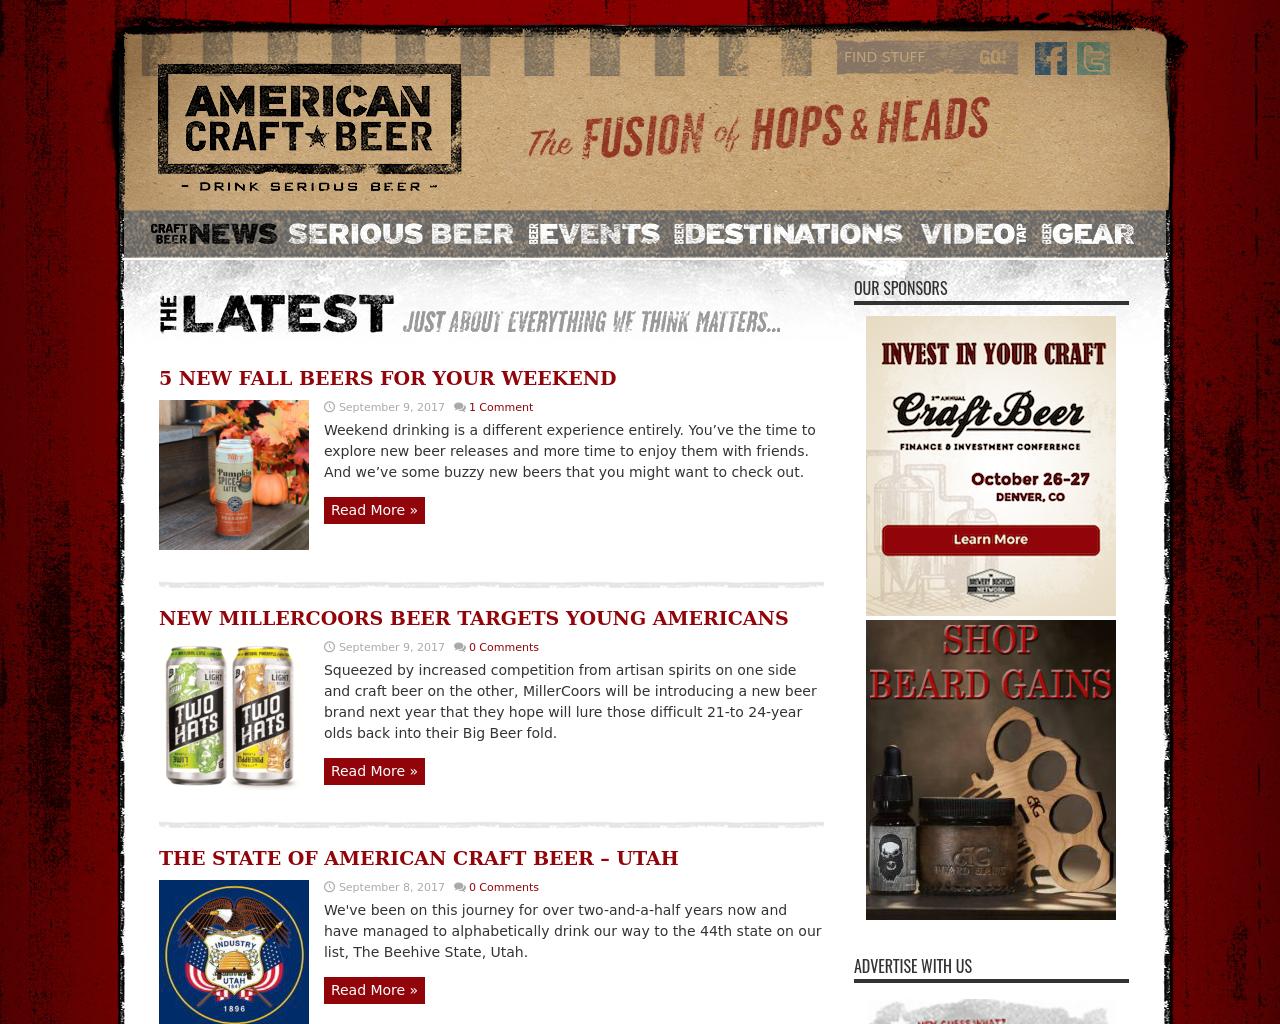 AMERICAN-CRAFT-BEER-Advertising-Reviews-Pricing